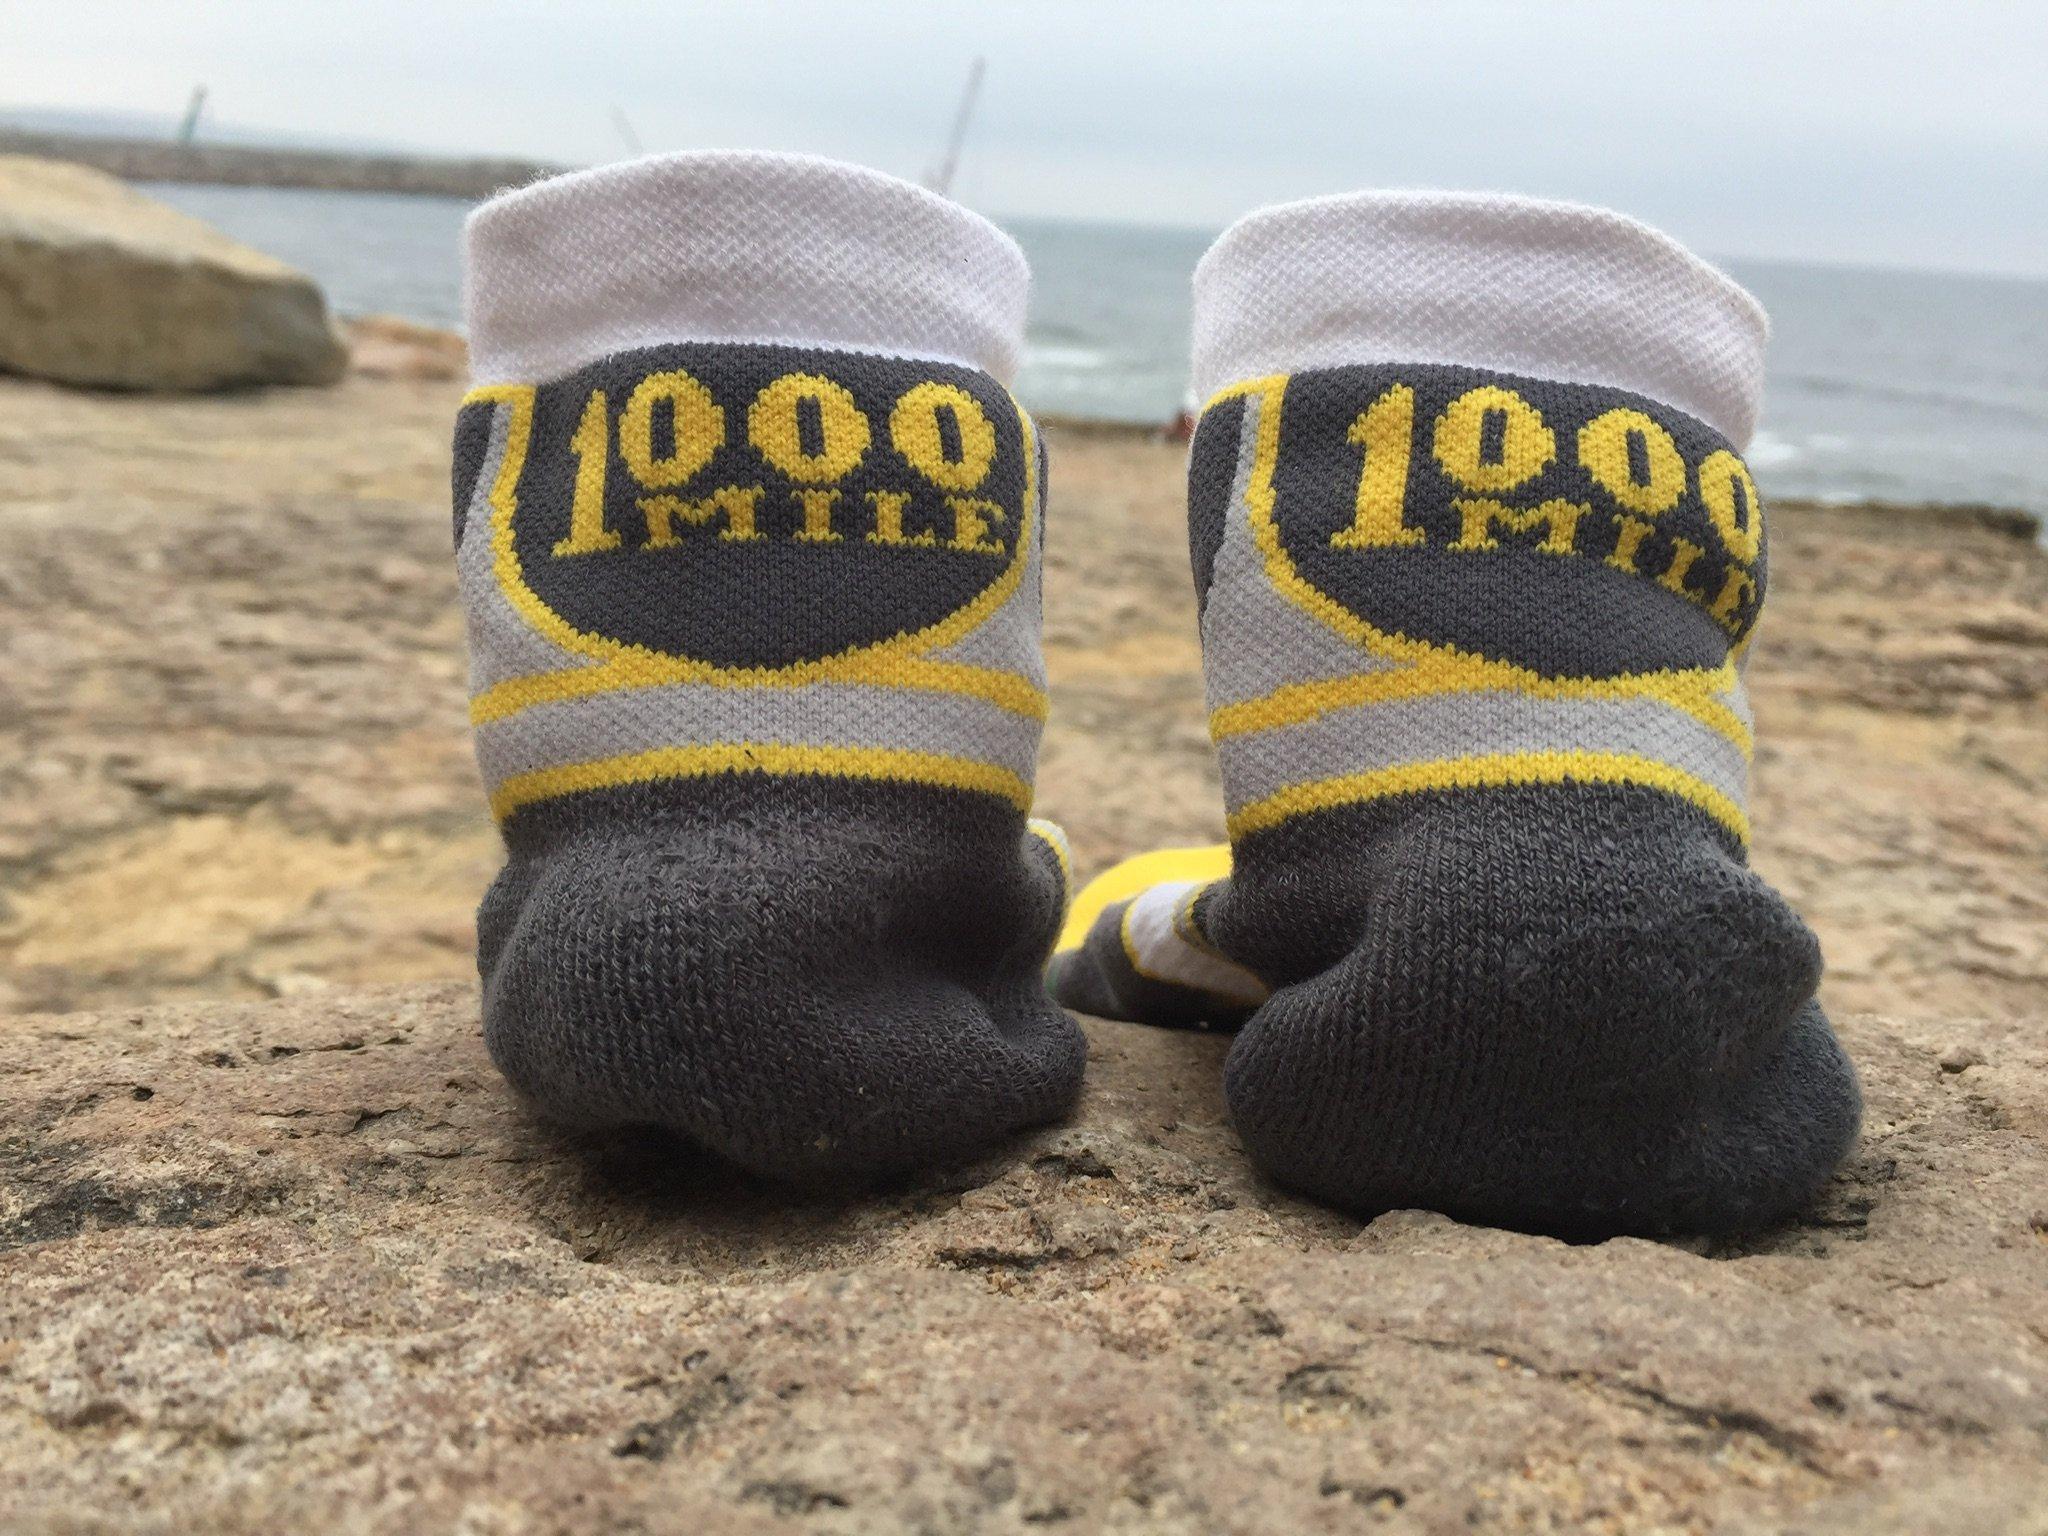 1000 MILE CROSS SPORT SOCK